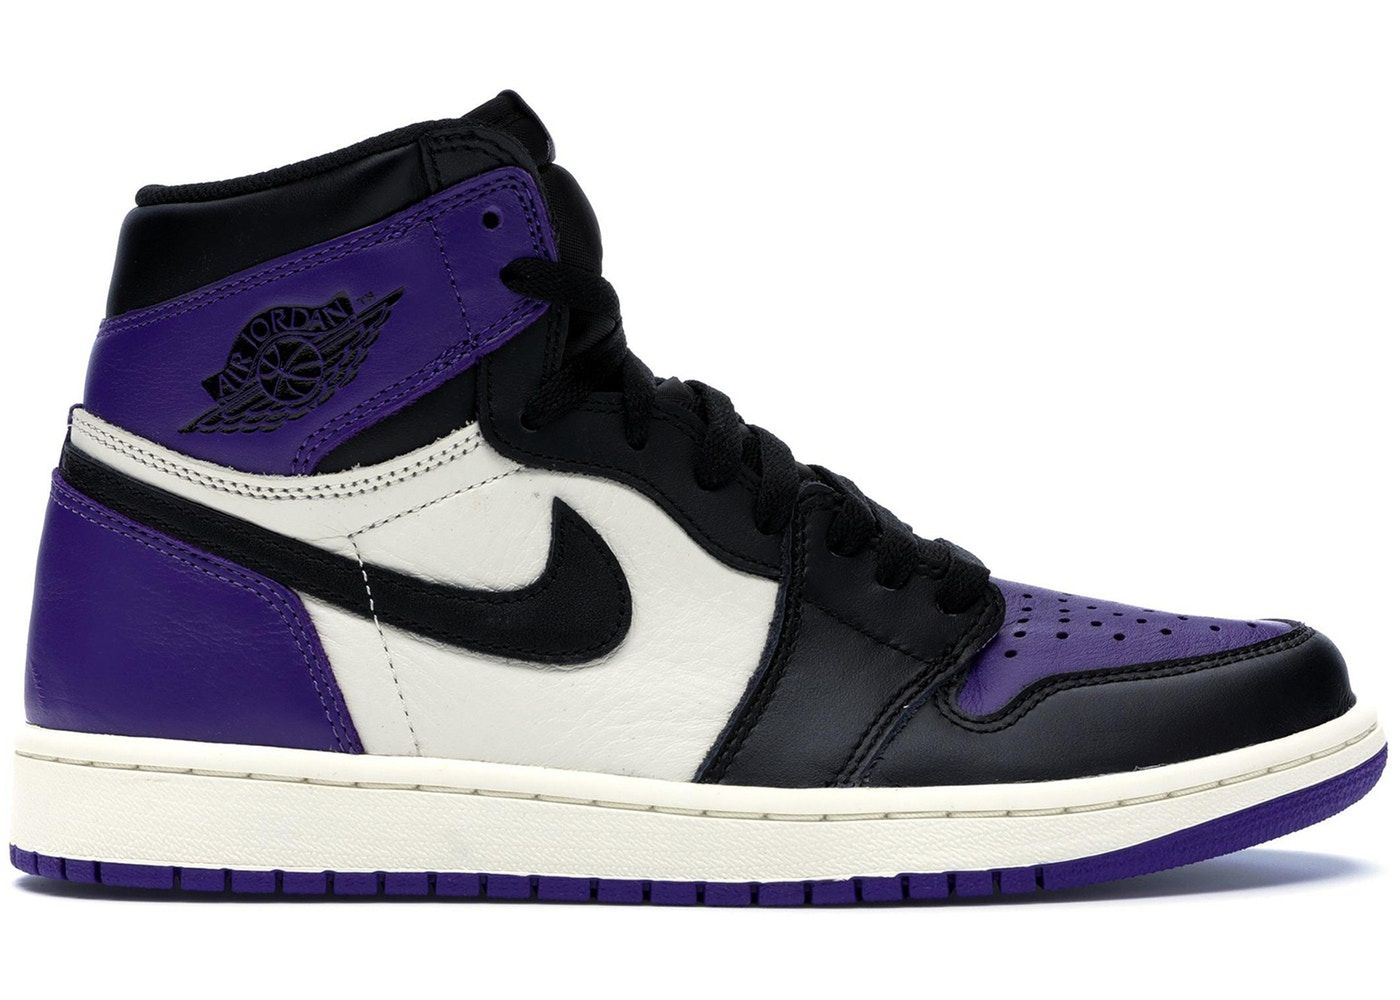 5c345f5c Jordan 1 Retro High Court Purple in 2019 | Nba | Jordans, Sneakers ...